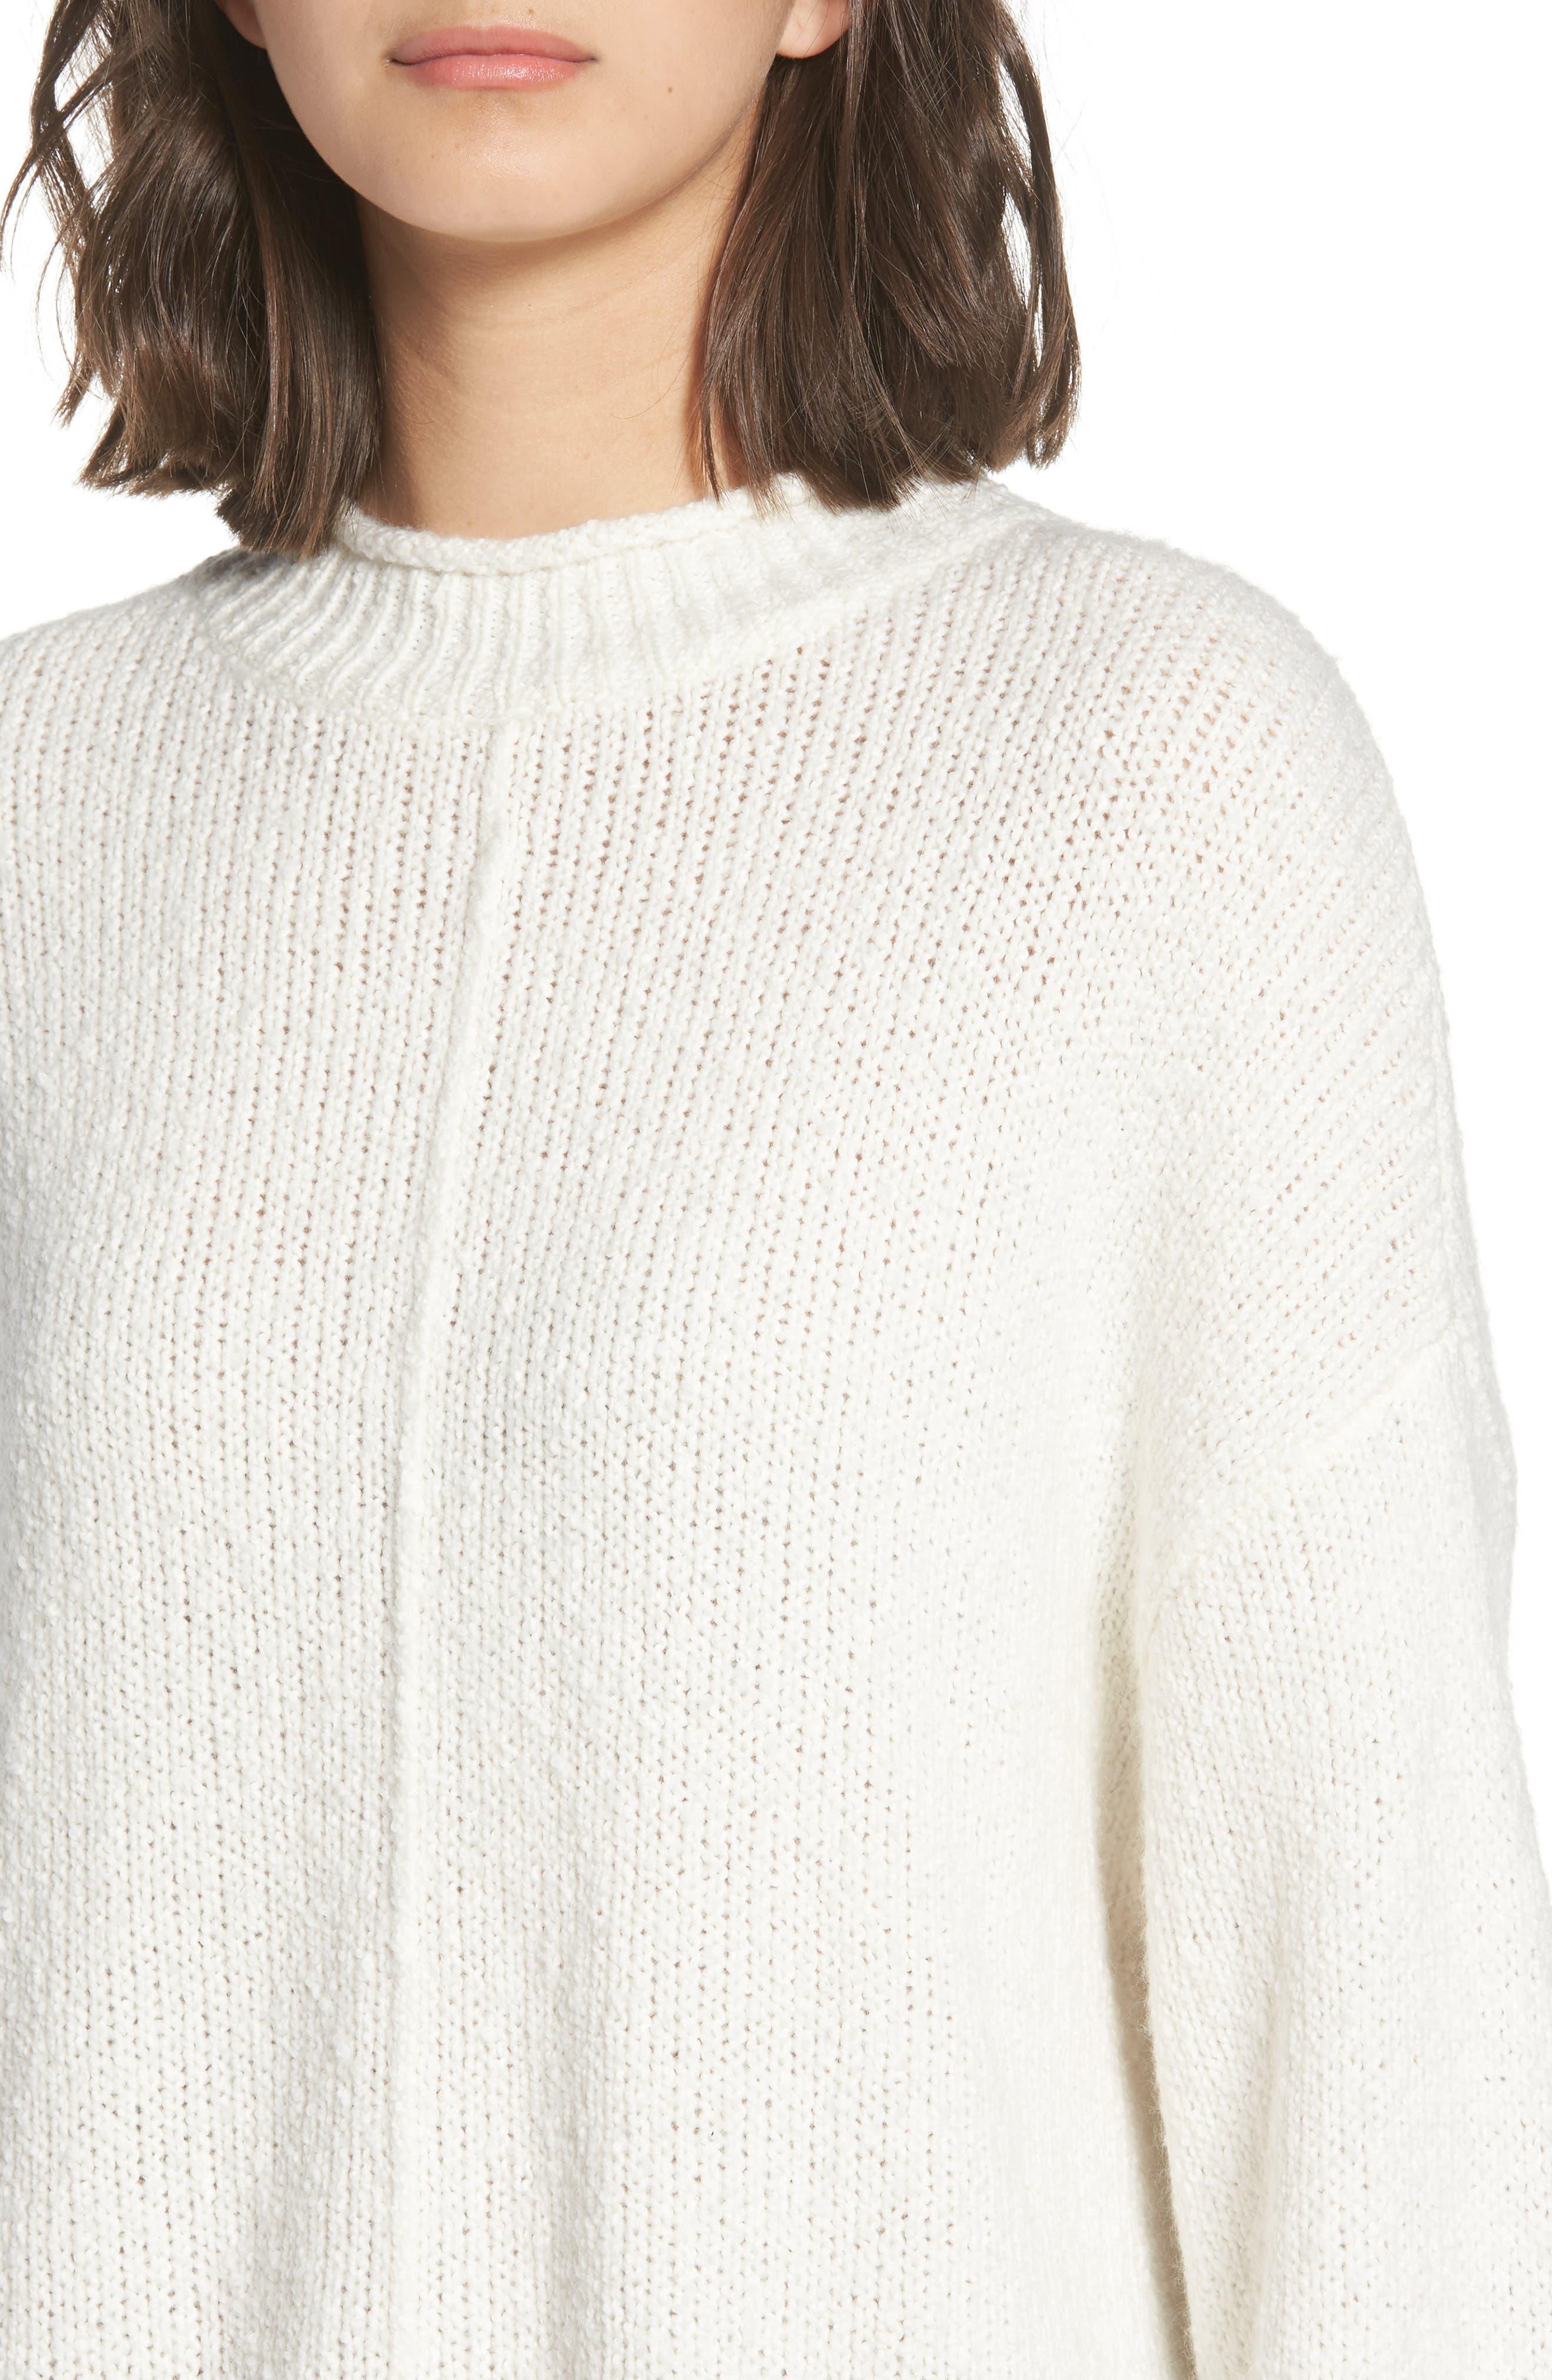 Balloon Sleeve Sweater,                             Alternate thumbnail 4, color,                             Ivory